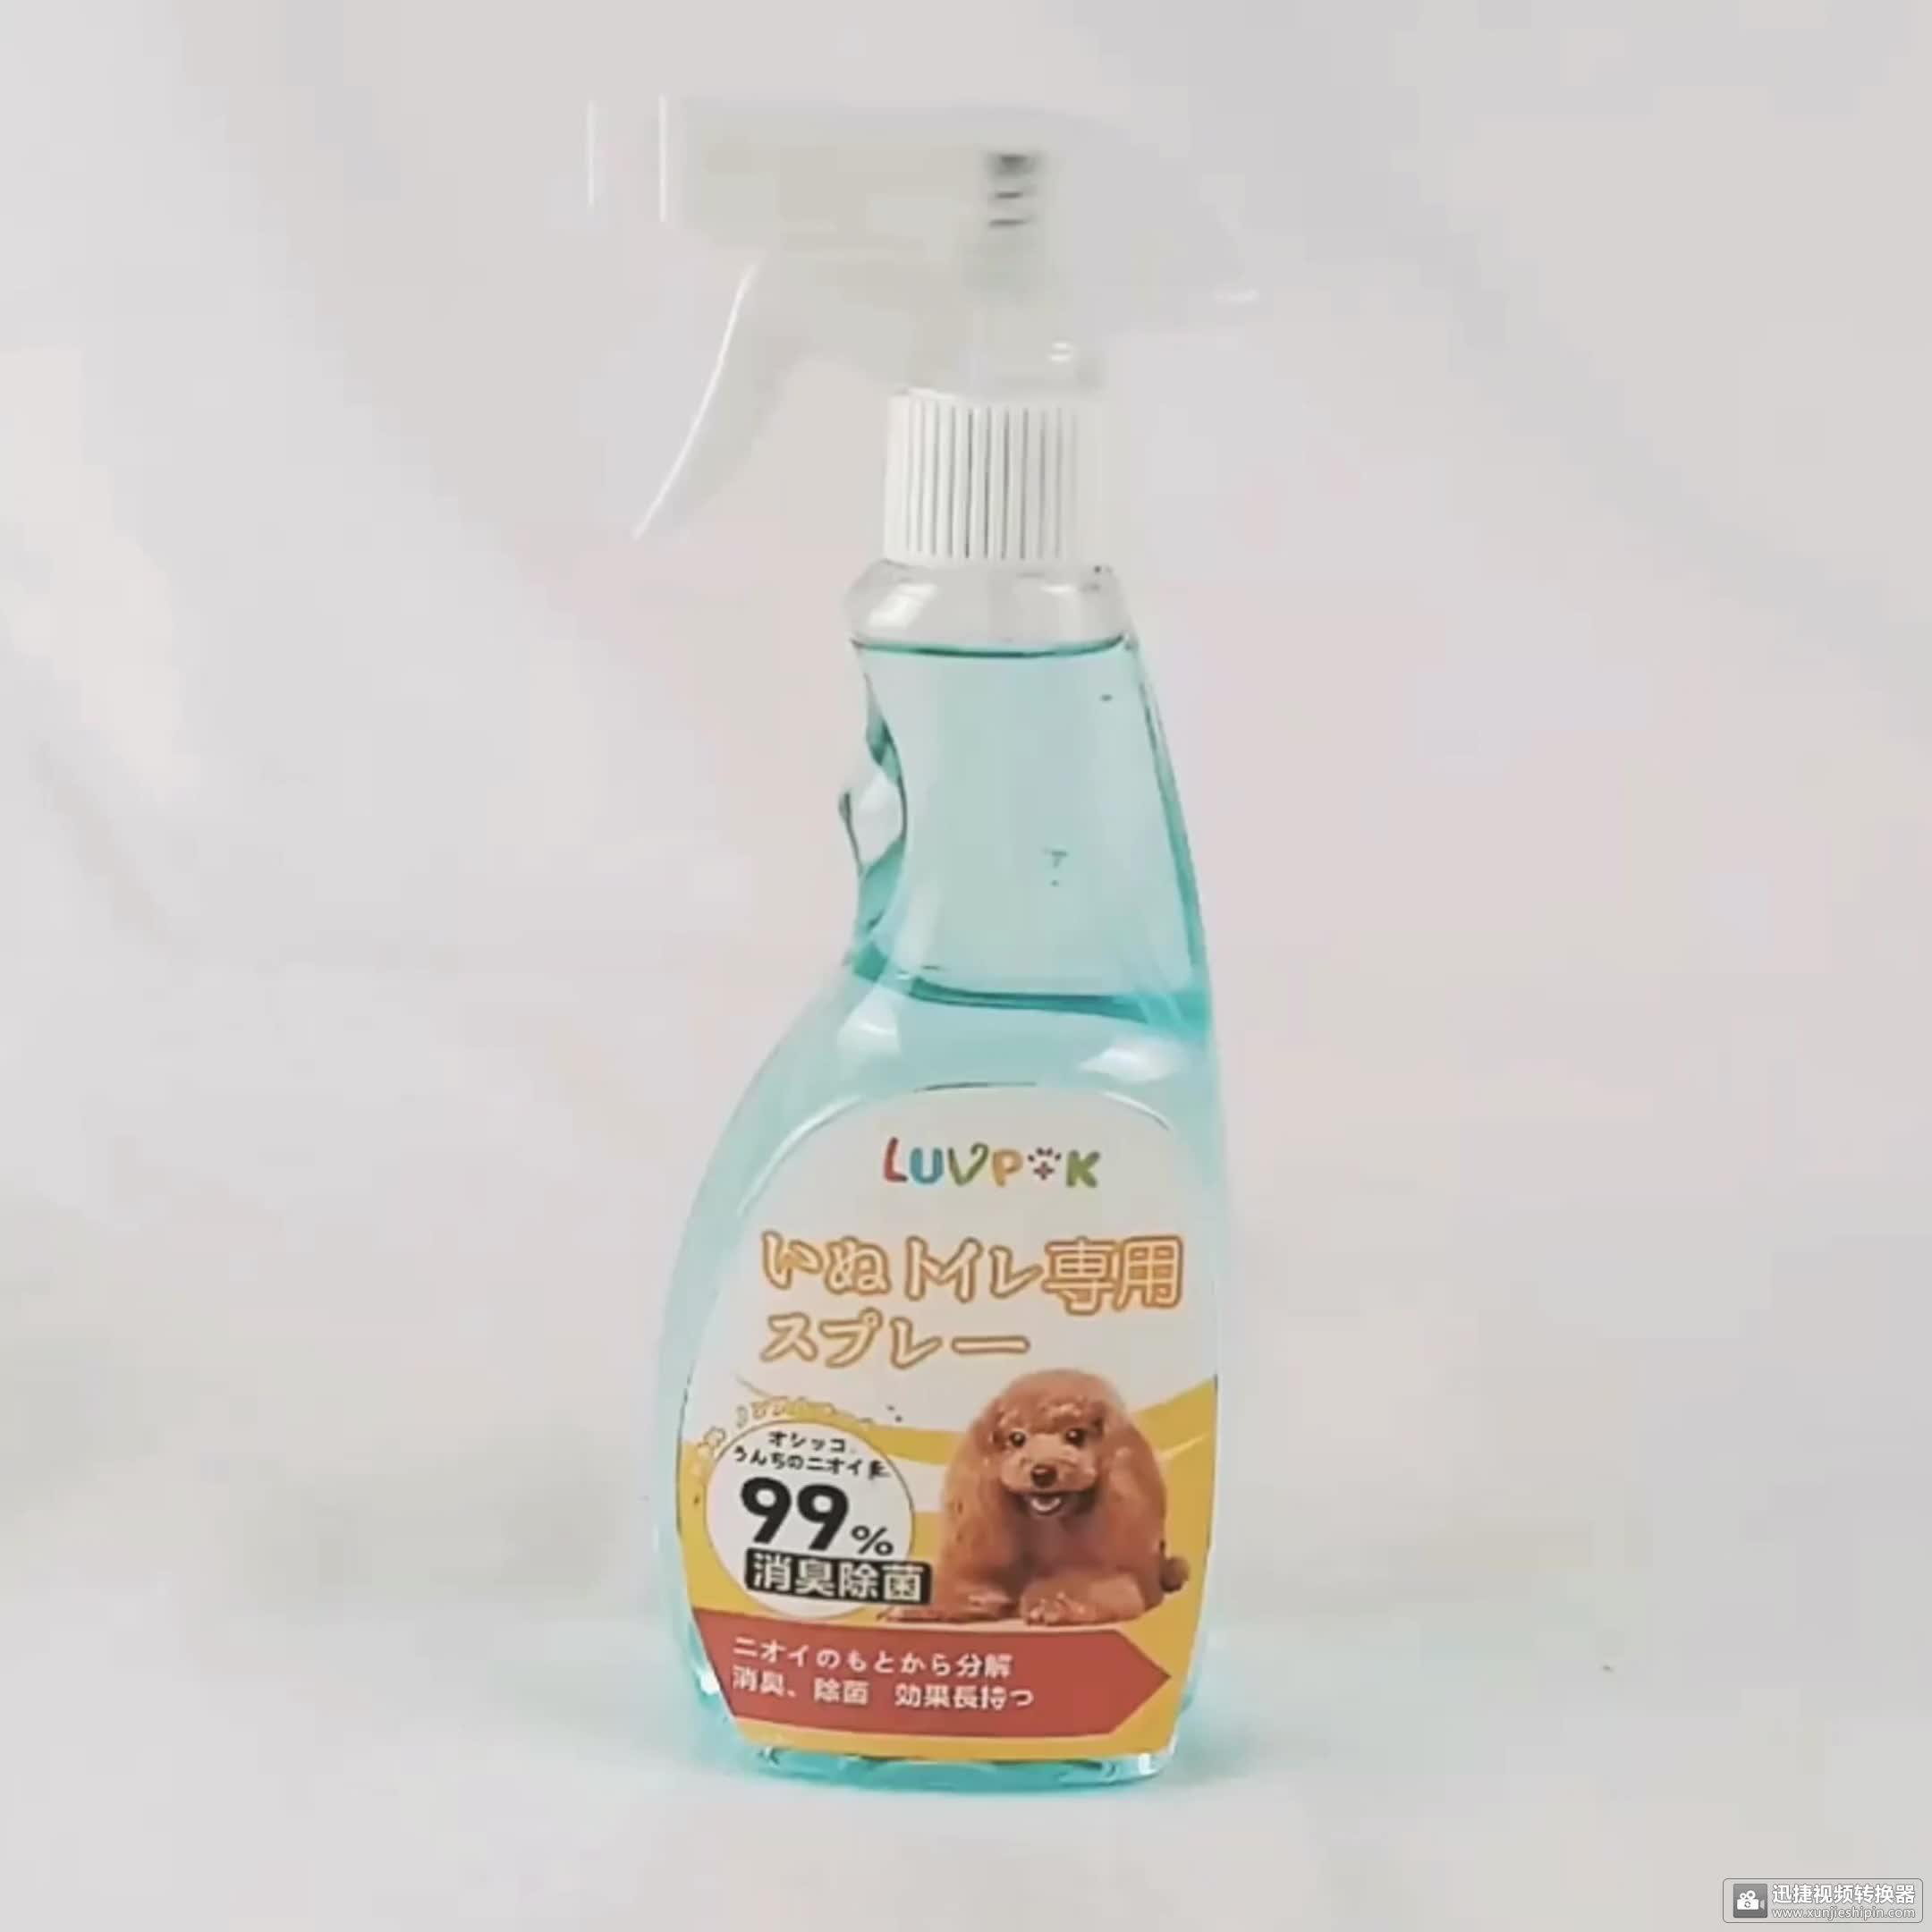 LUVP+K 2019 New Pet Fragrance Spray Hot Professional Air Fresheners  Pet Deodorant Natural Deodorant Spray For Dog